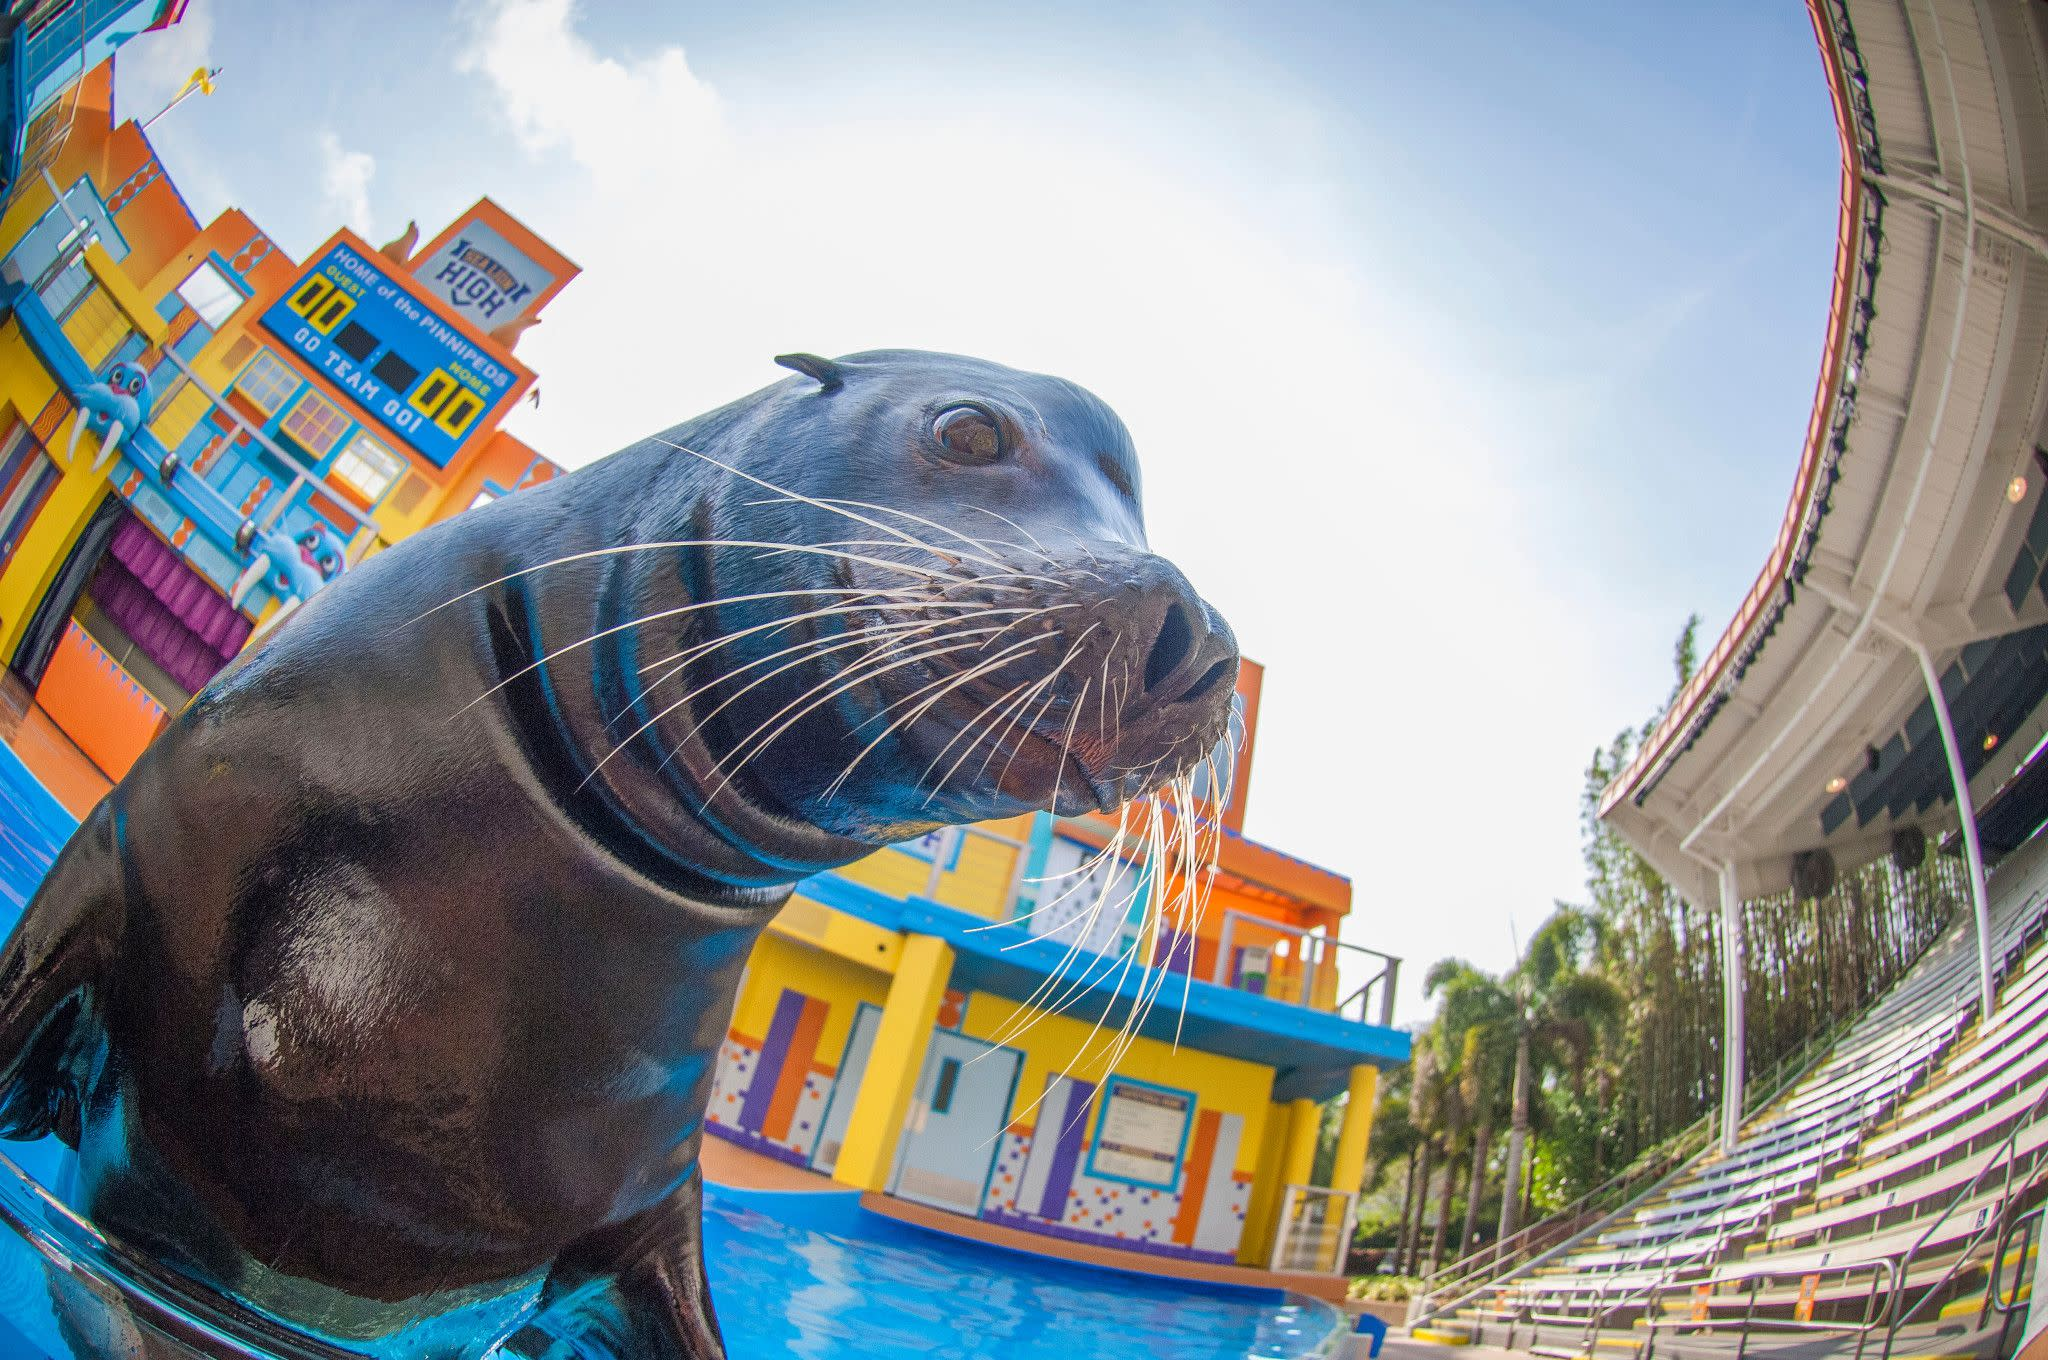 Sea Lion High at SeaWorld Orlando's Bayside Stadium